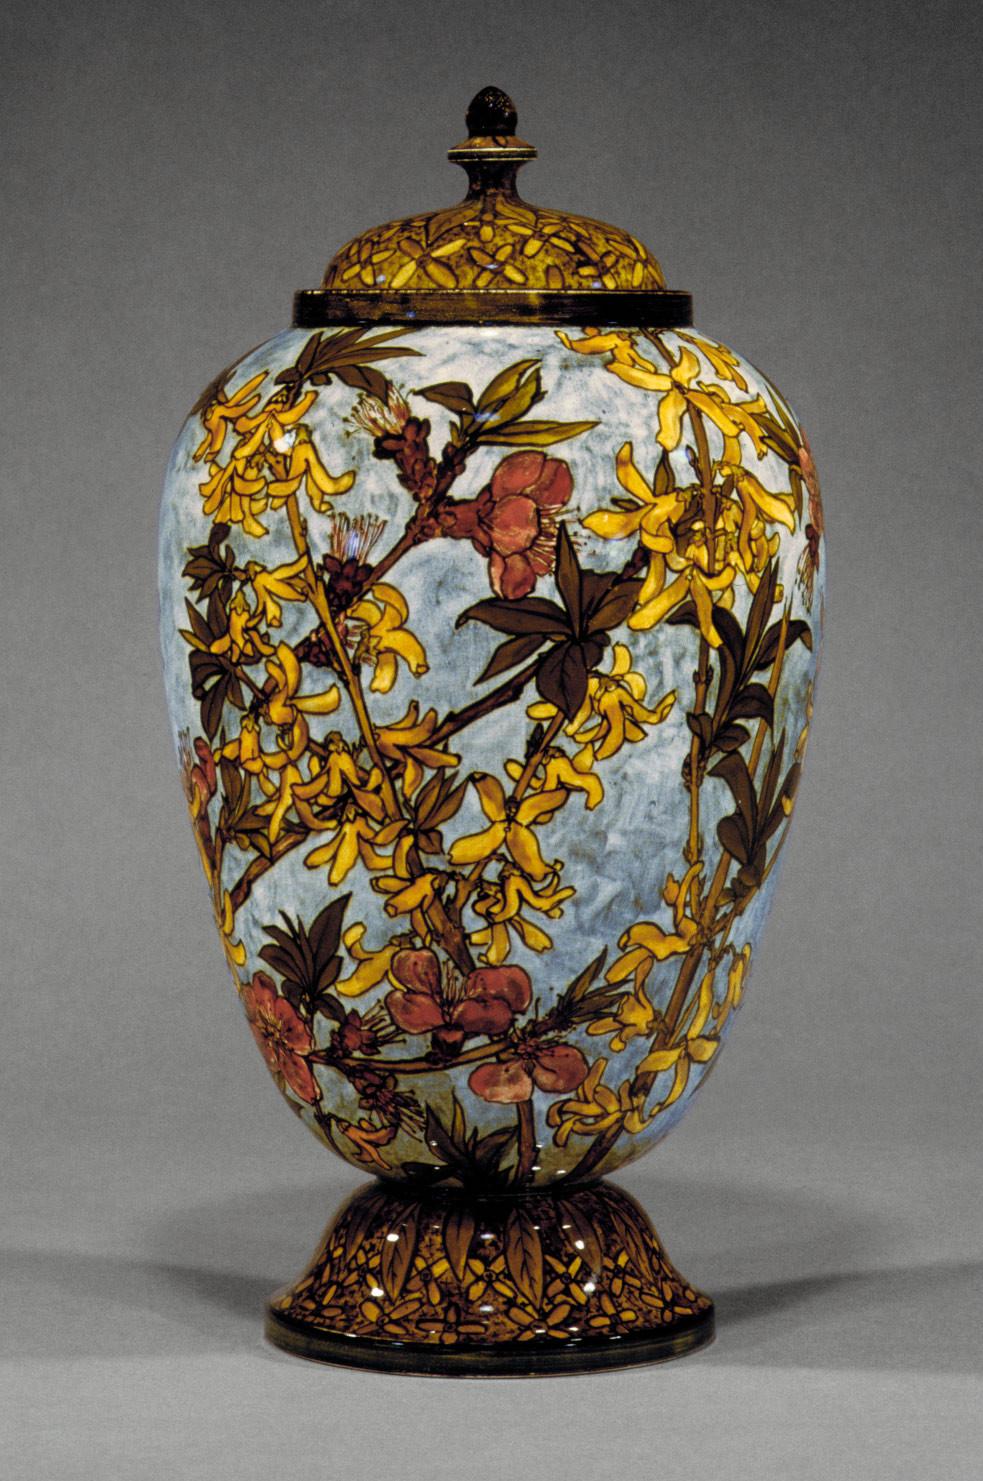 jpl france vase of women china decorators essay heilbrunn timeline of art history intended for vase vase